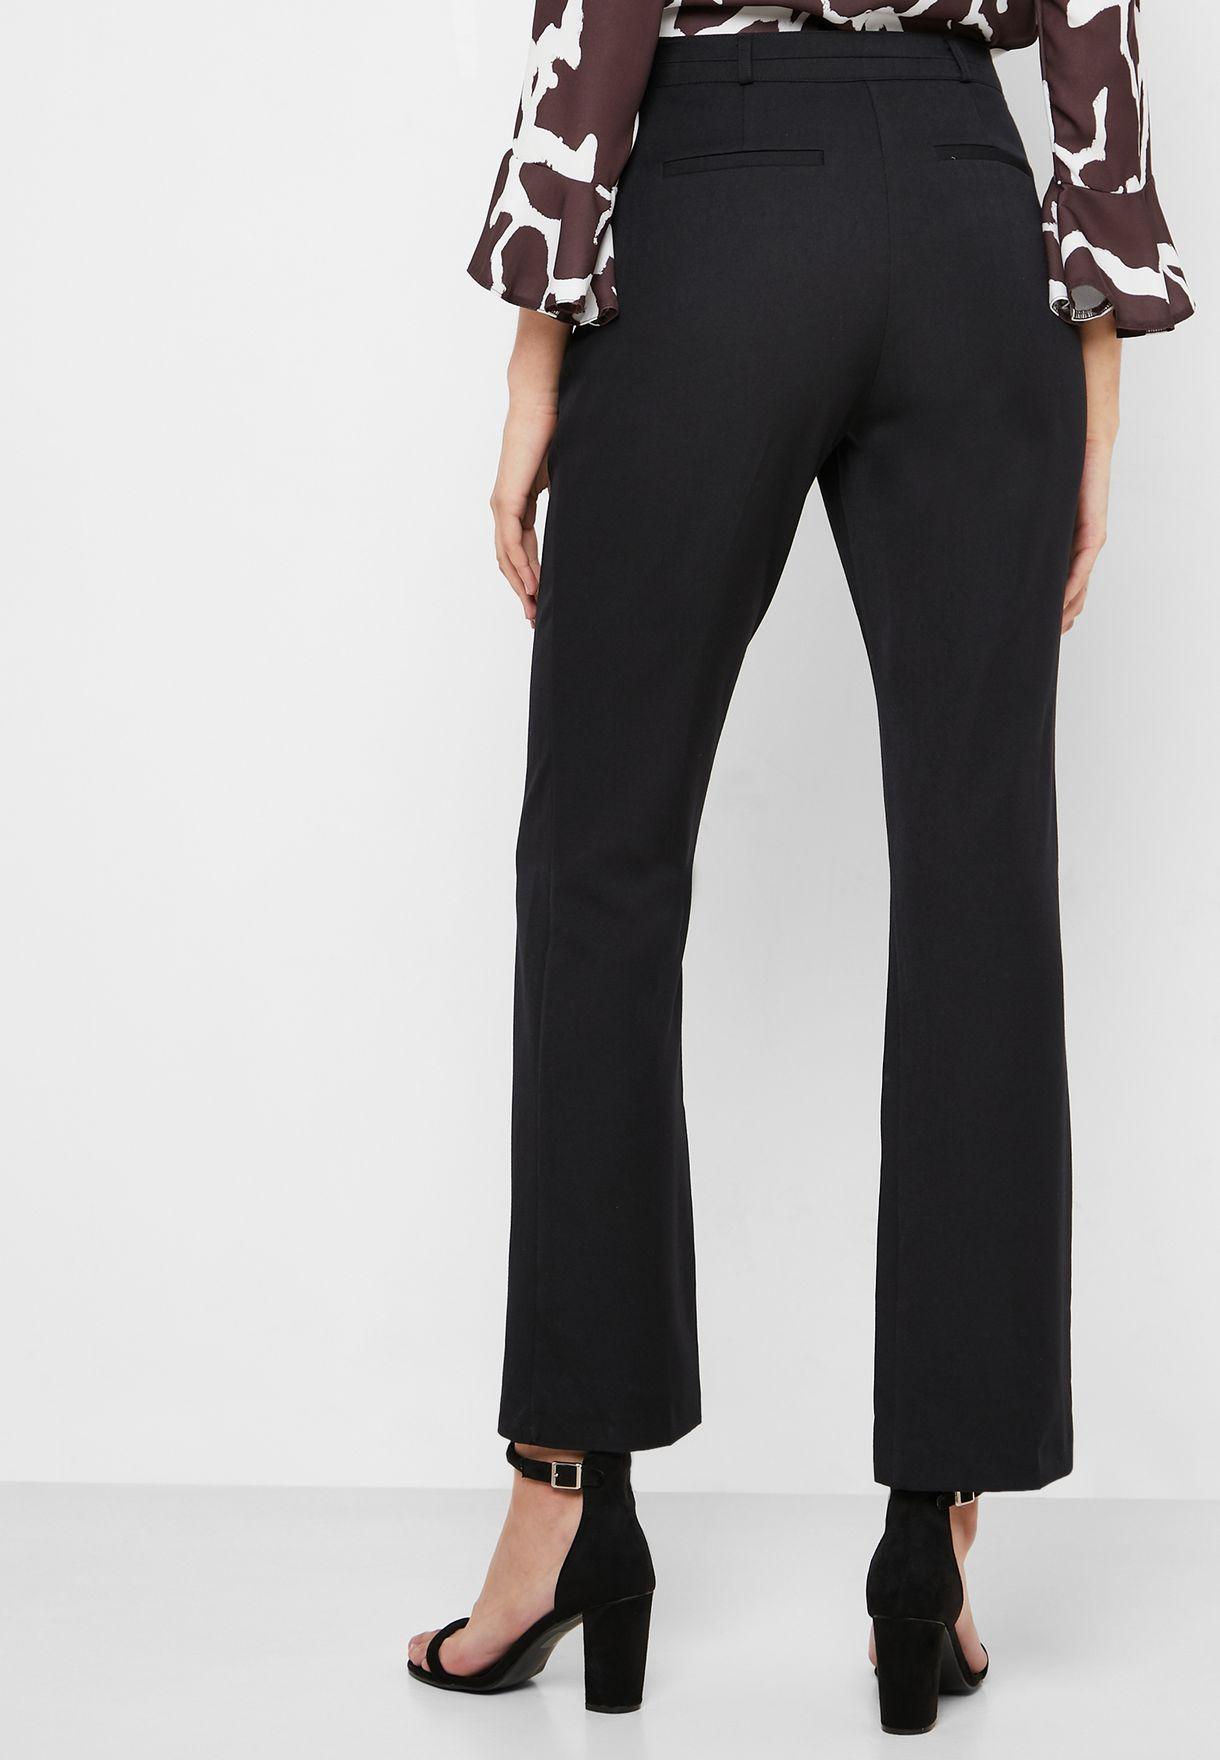 Zip Detail Pants